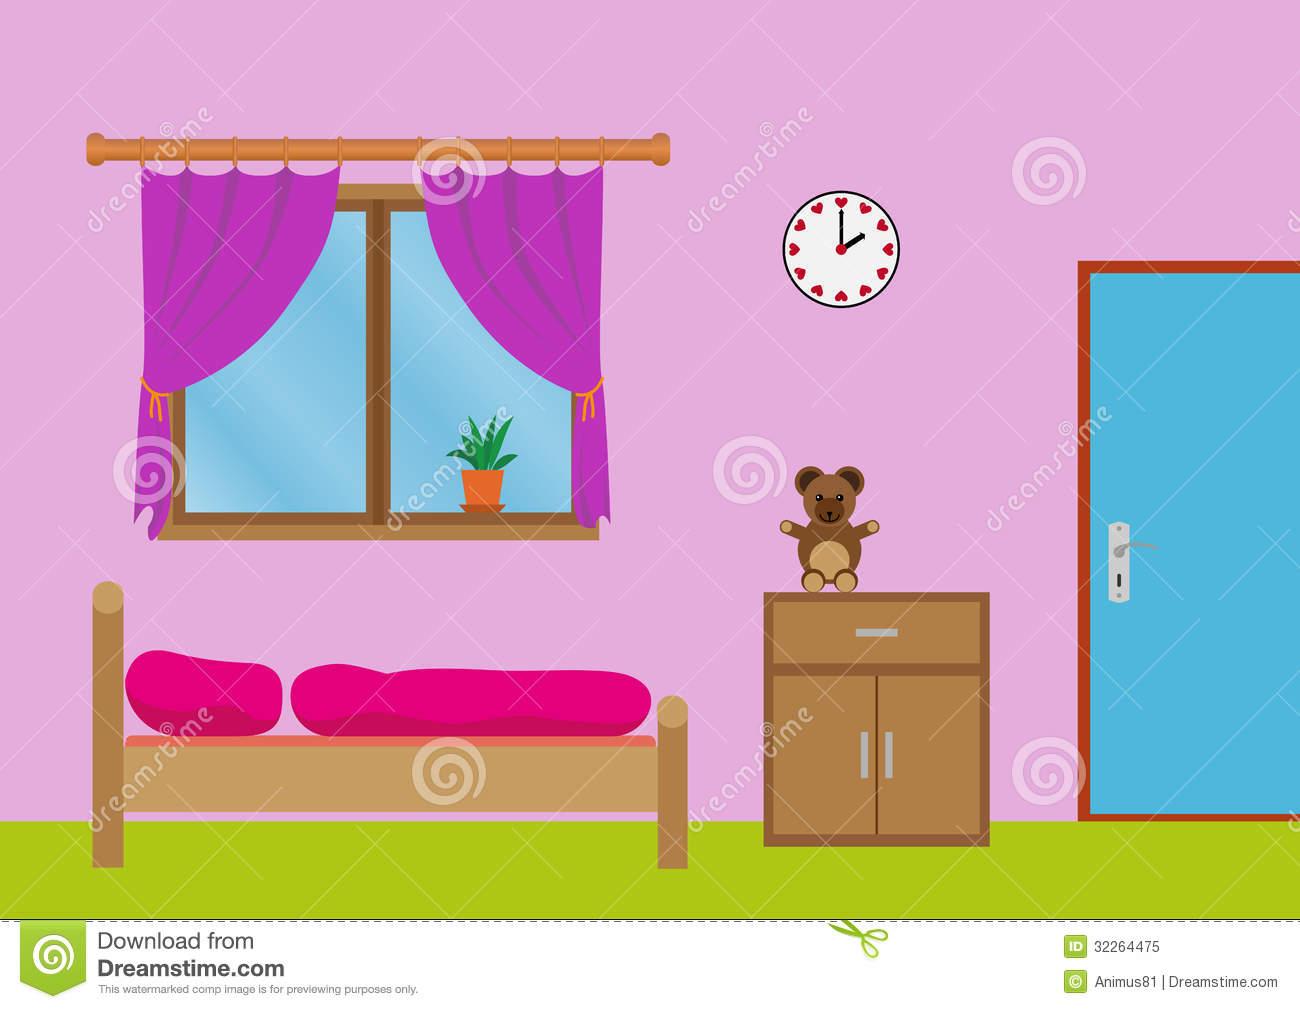 Bedroom clipart room wall Room Clipart My Panda Clipart